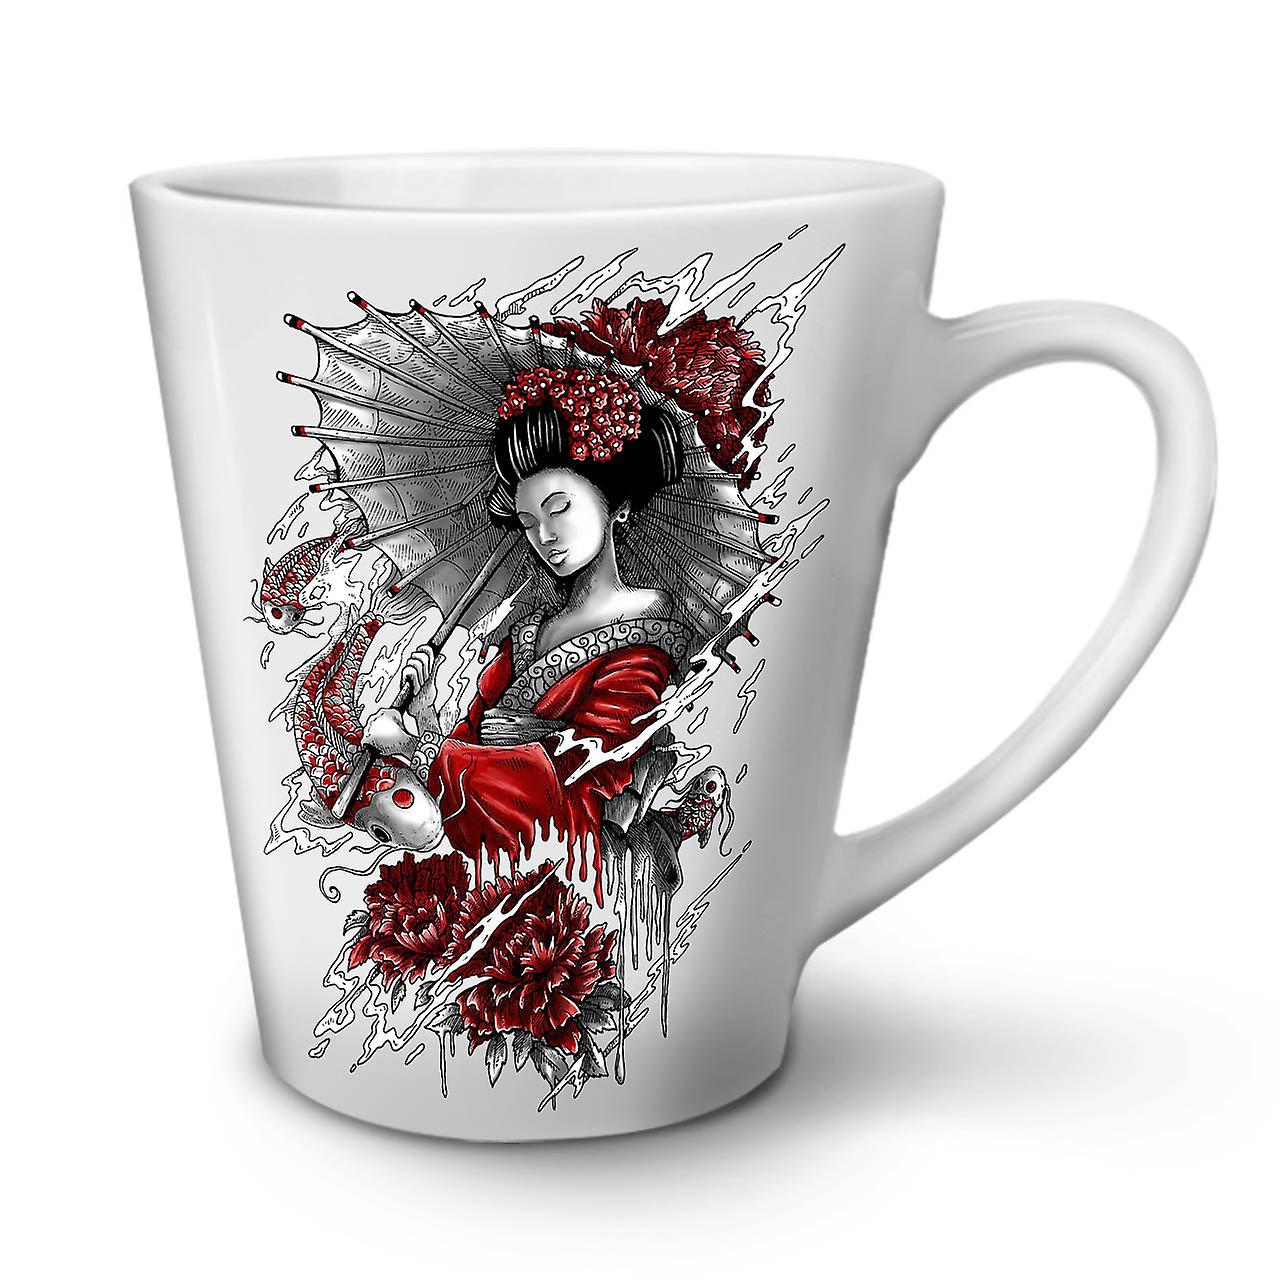 OzWellcoda New White Coffee Mug Umbrella Tea 12 Japan Ceramic Latte HWEID29